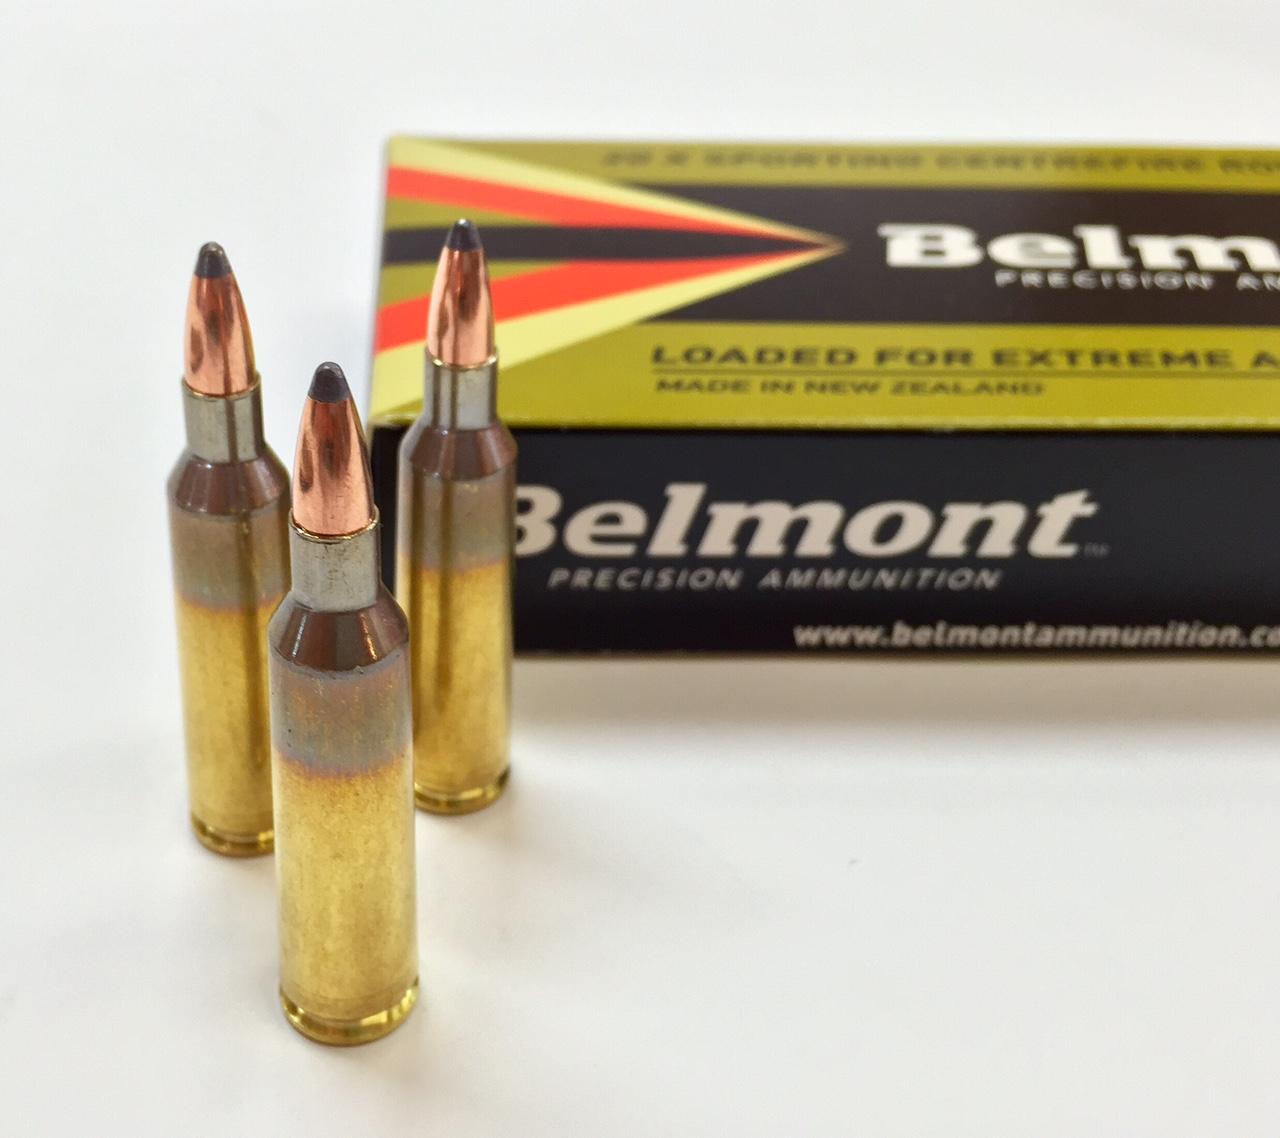 22-250 60gr SP (Nosler Partition Projectile) - 20 rounds